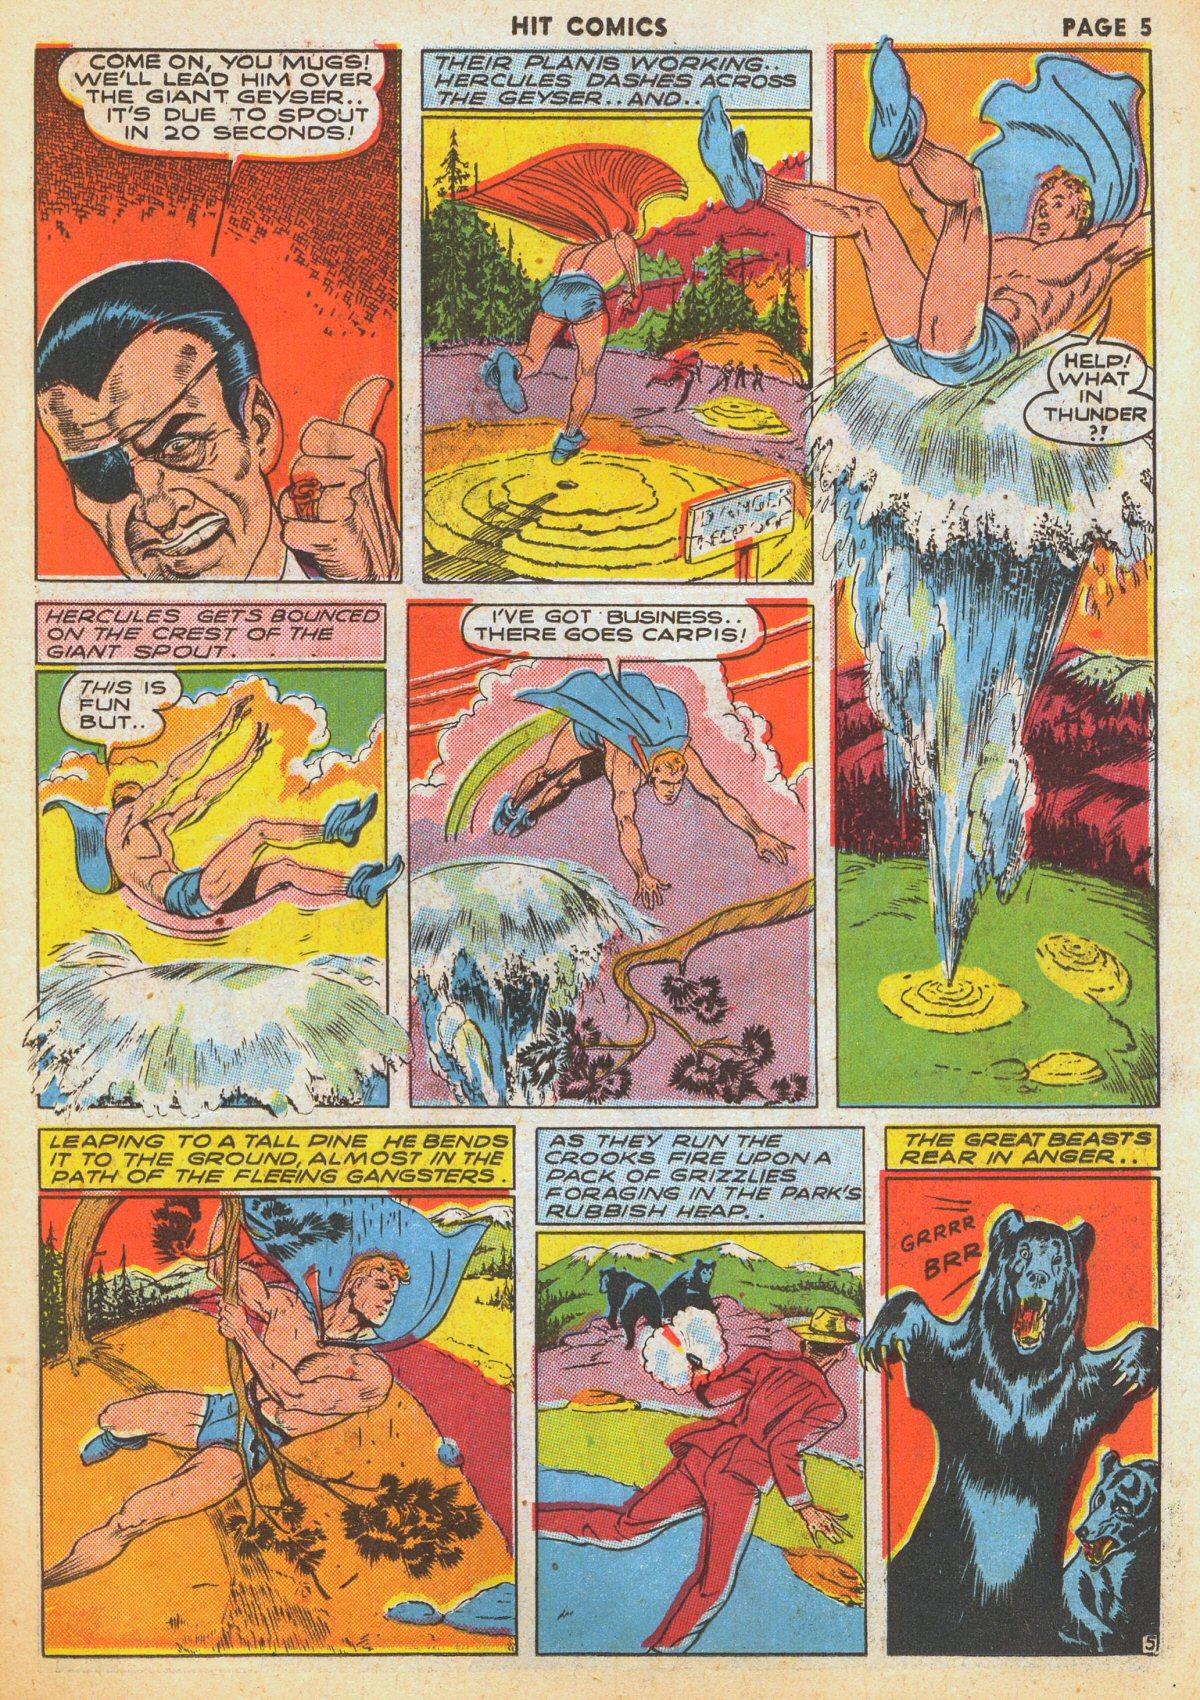 Read online Hit Comics comic -  Issue #12 - 7